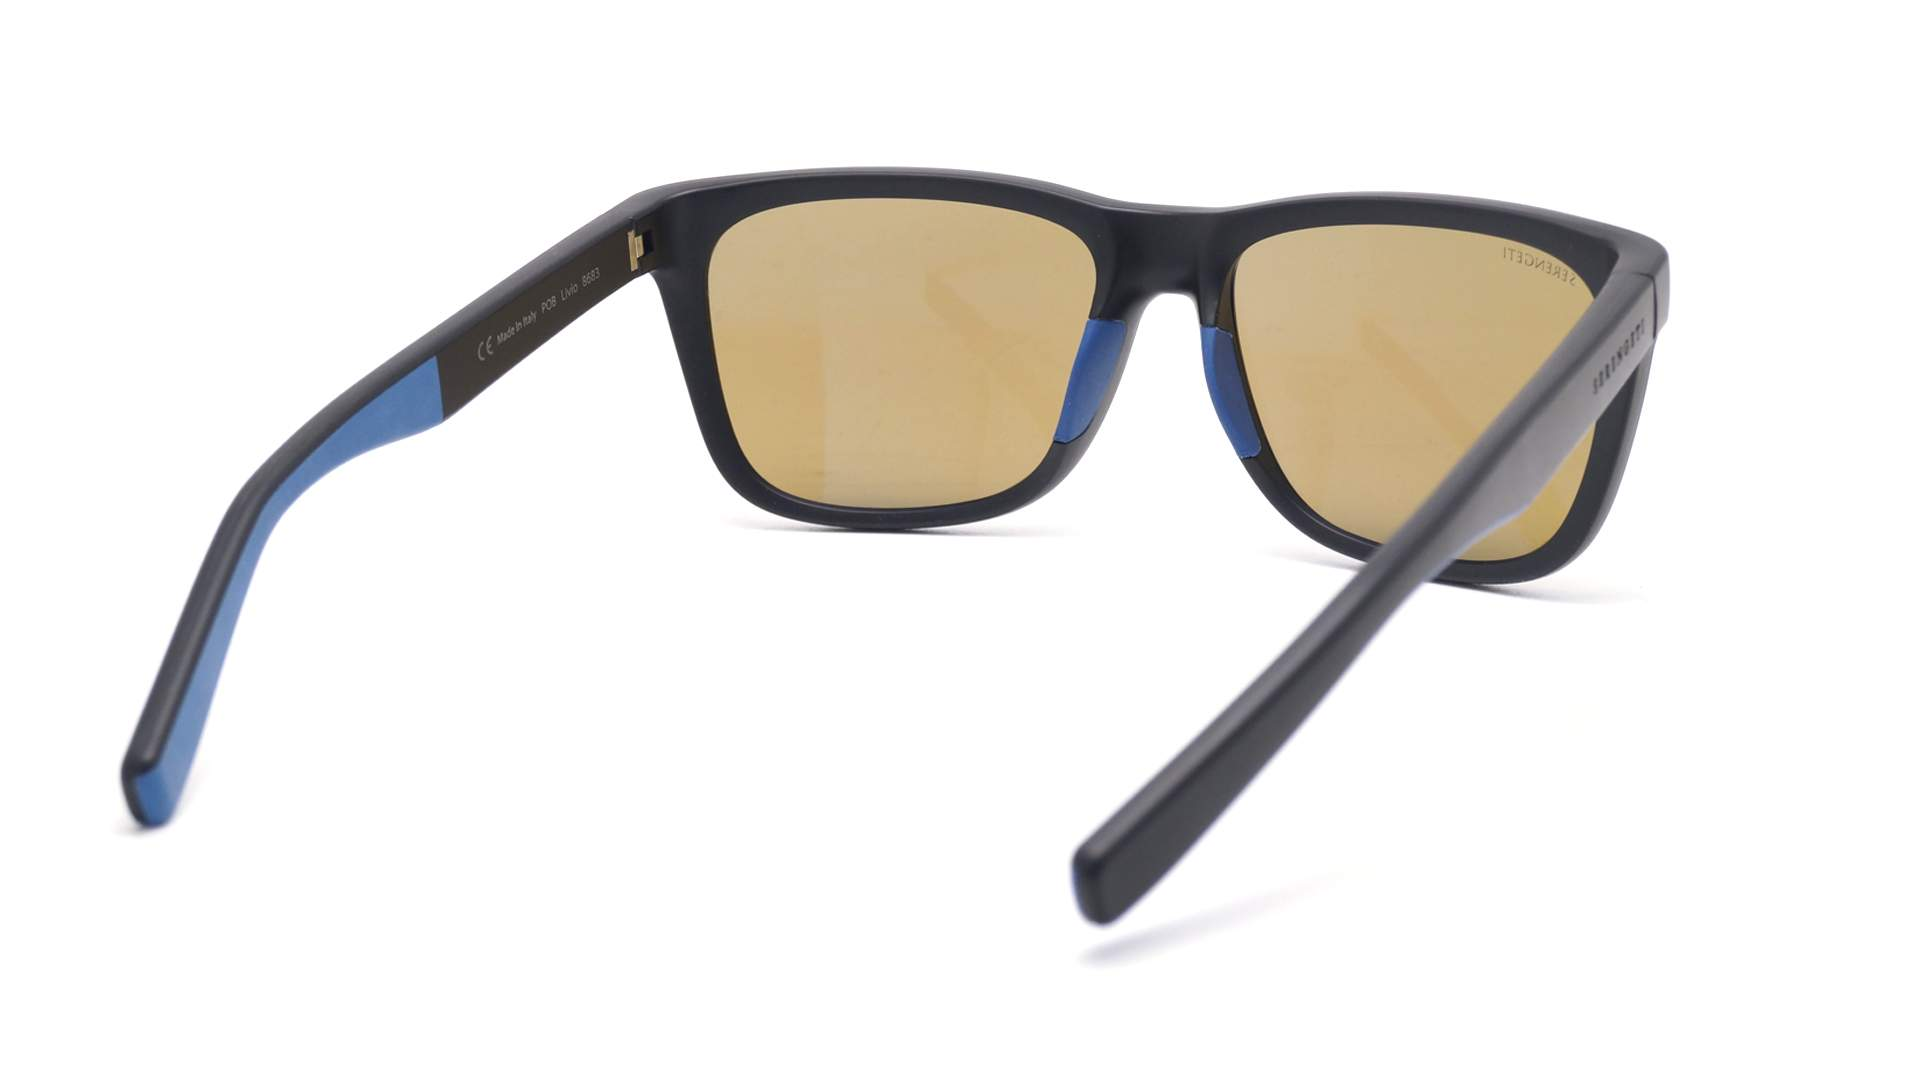 3cc6fe2f6ecf Sunglasses Serengeti Livio Black Matte 8683 57-15 Large Polarized  Photochromic Mirror